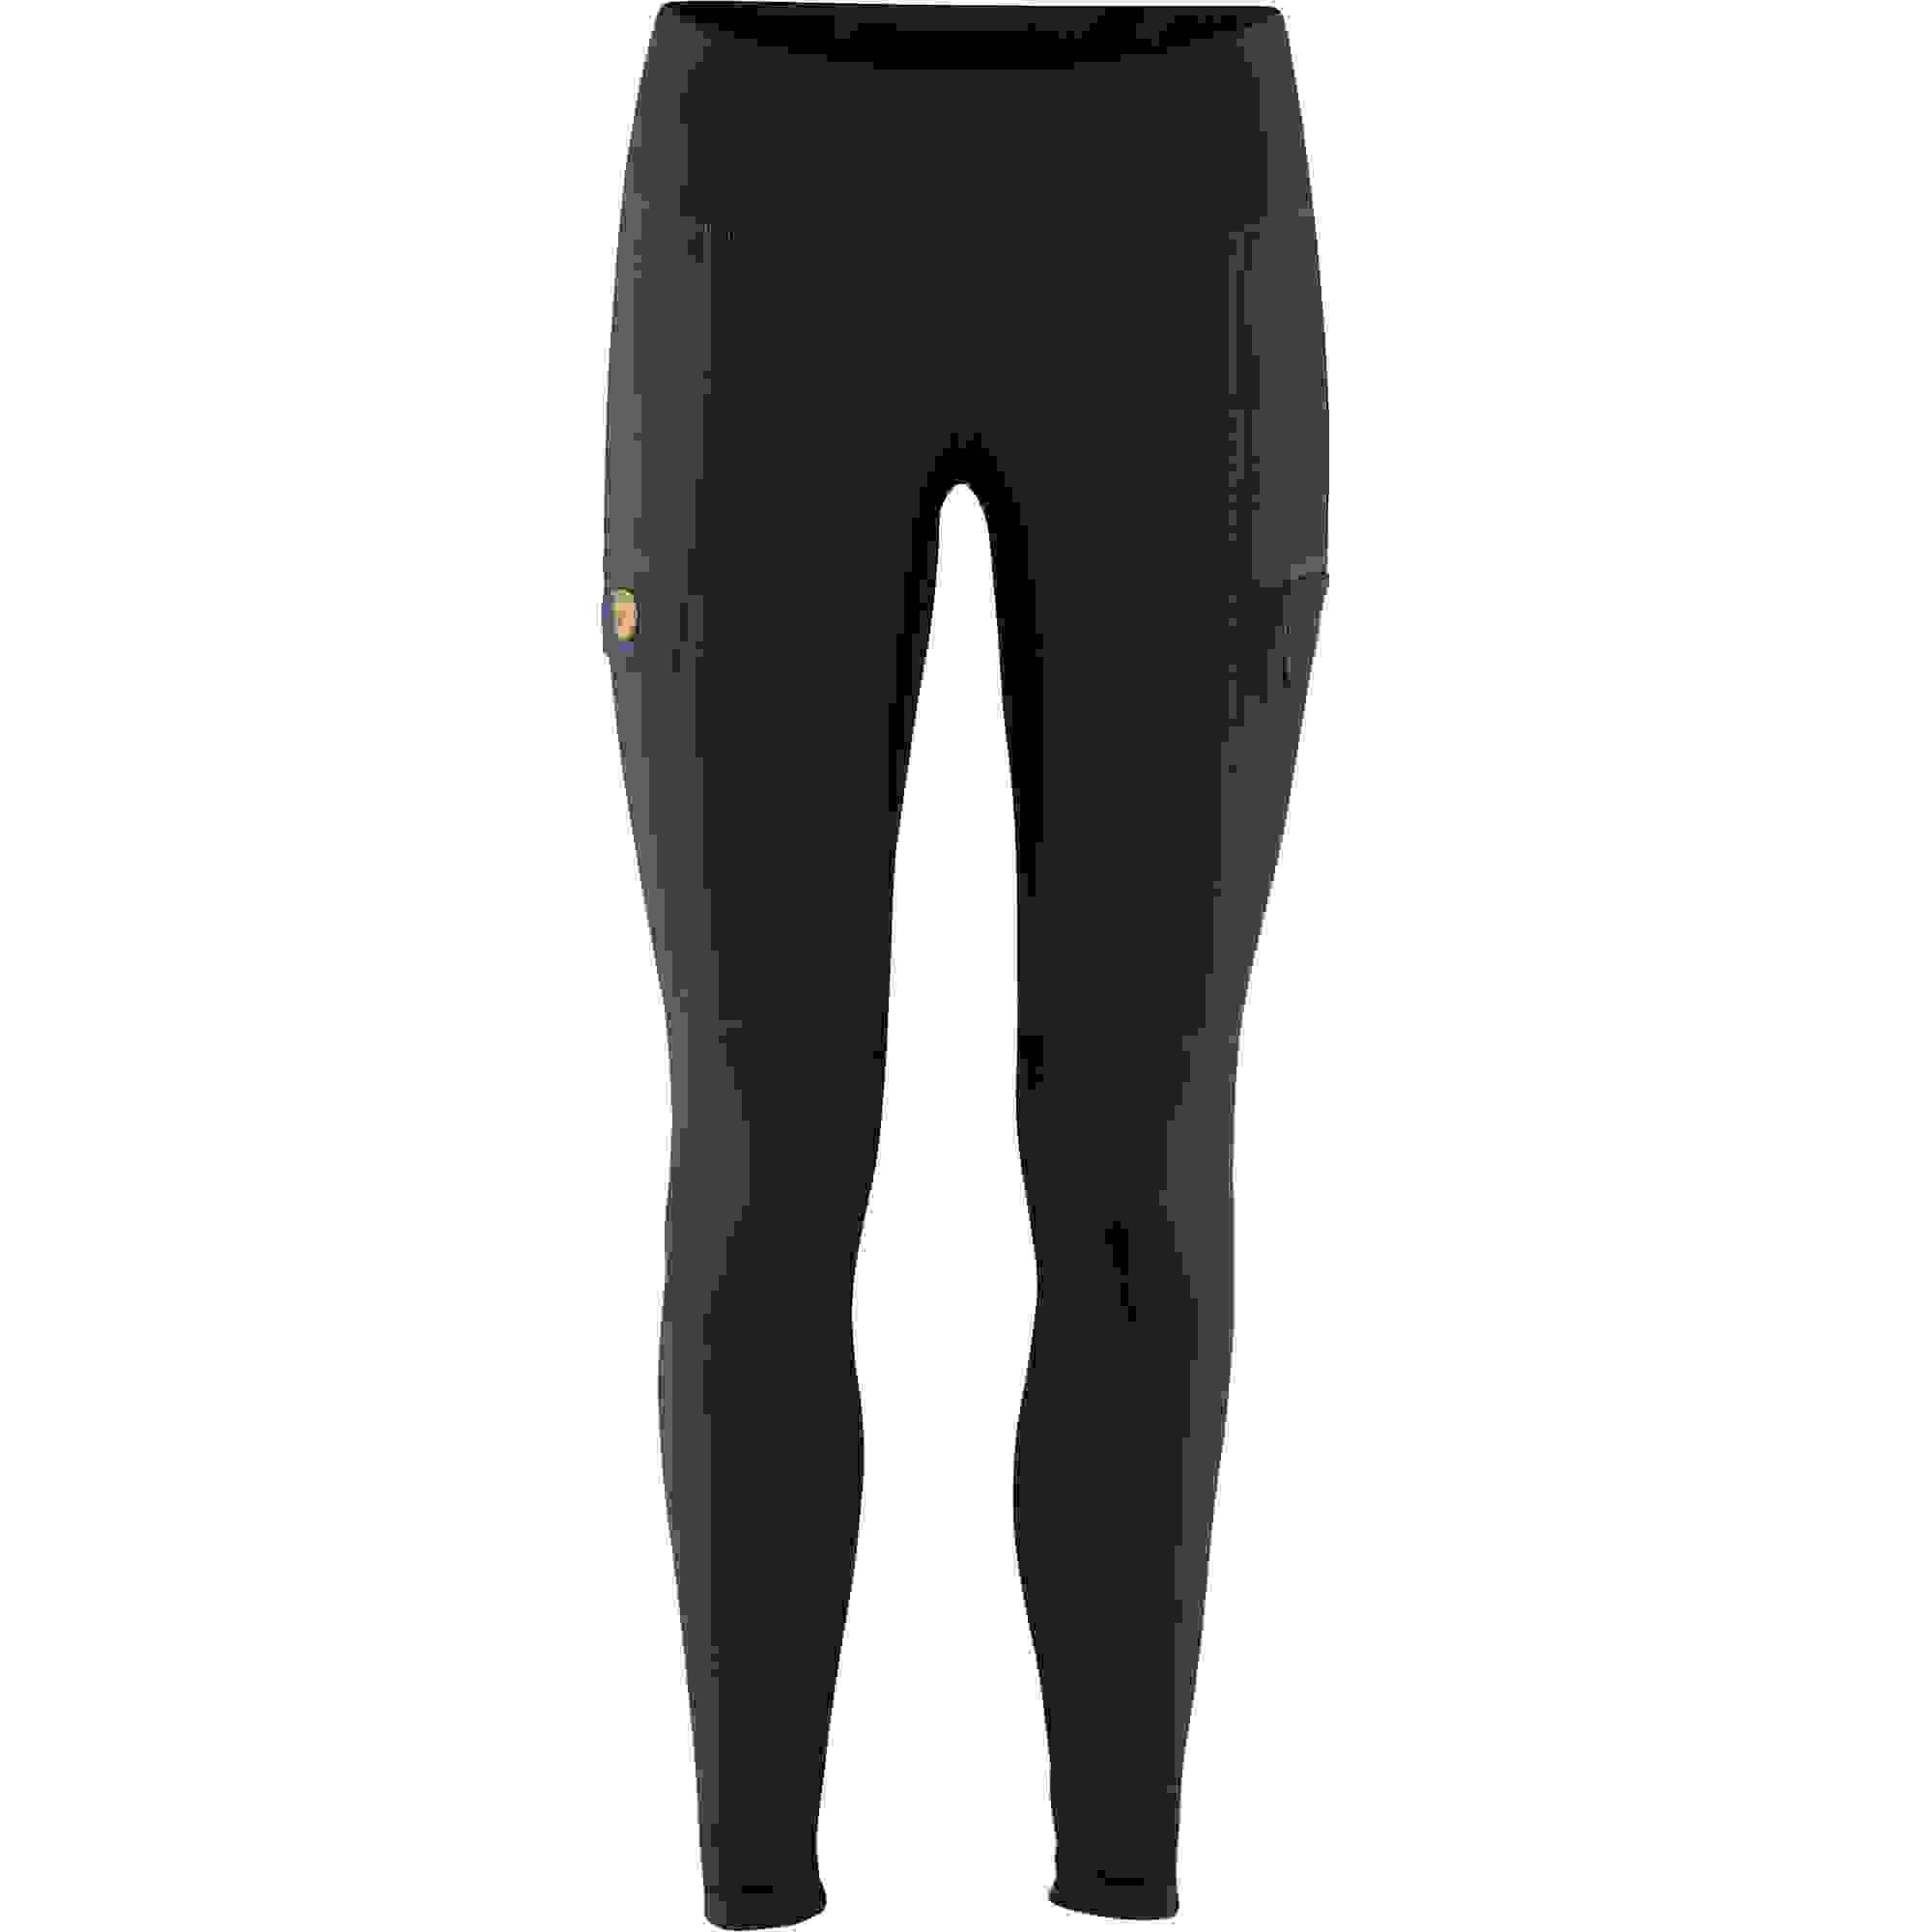 Navy All Sizes Fjallraven Abisko Trail Tights Womens Pants Walking